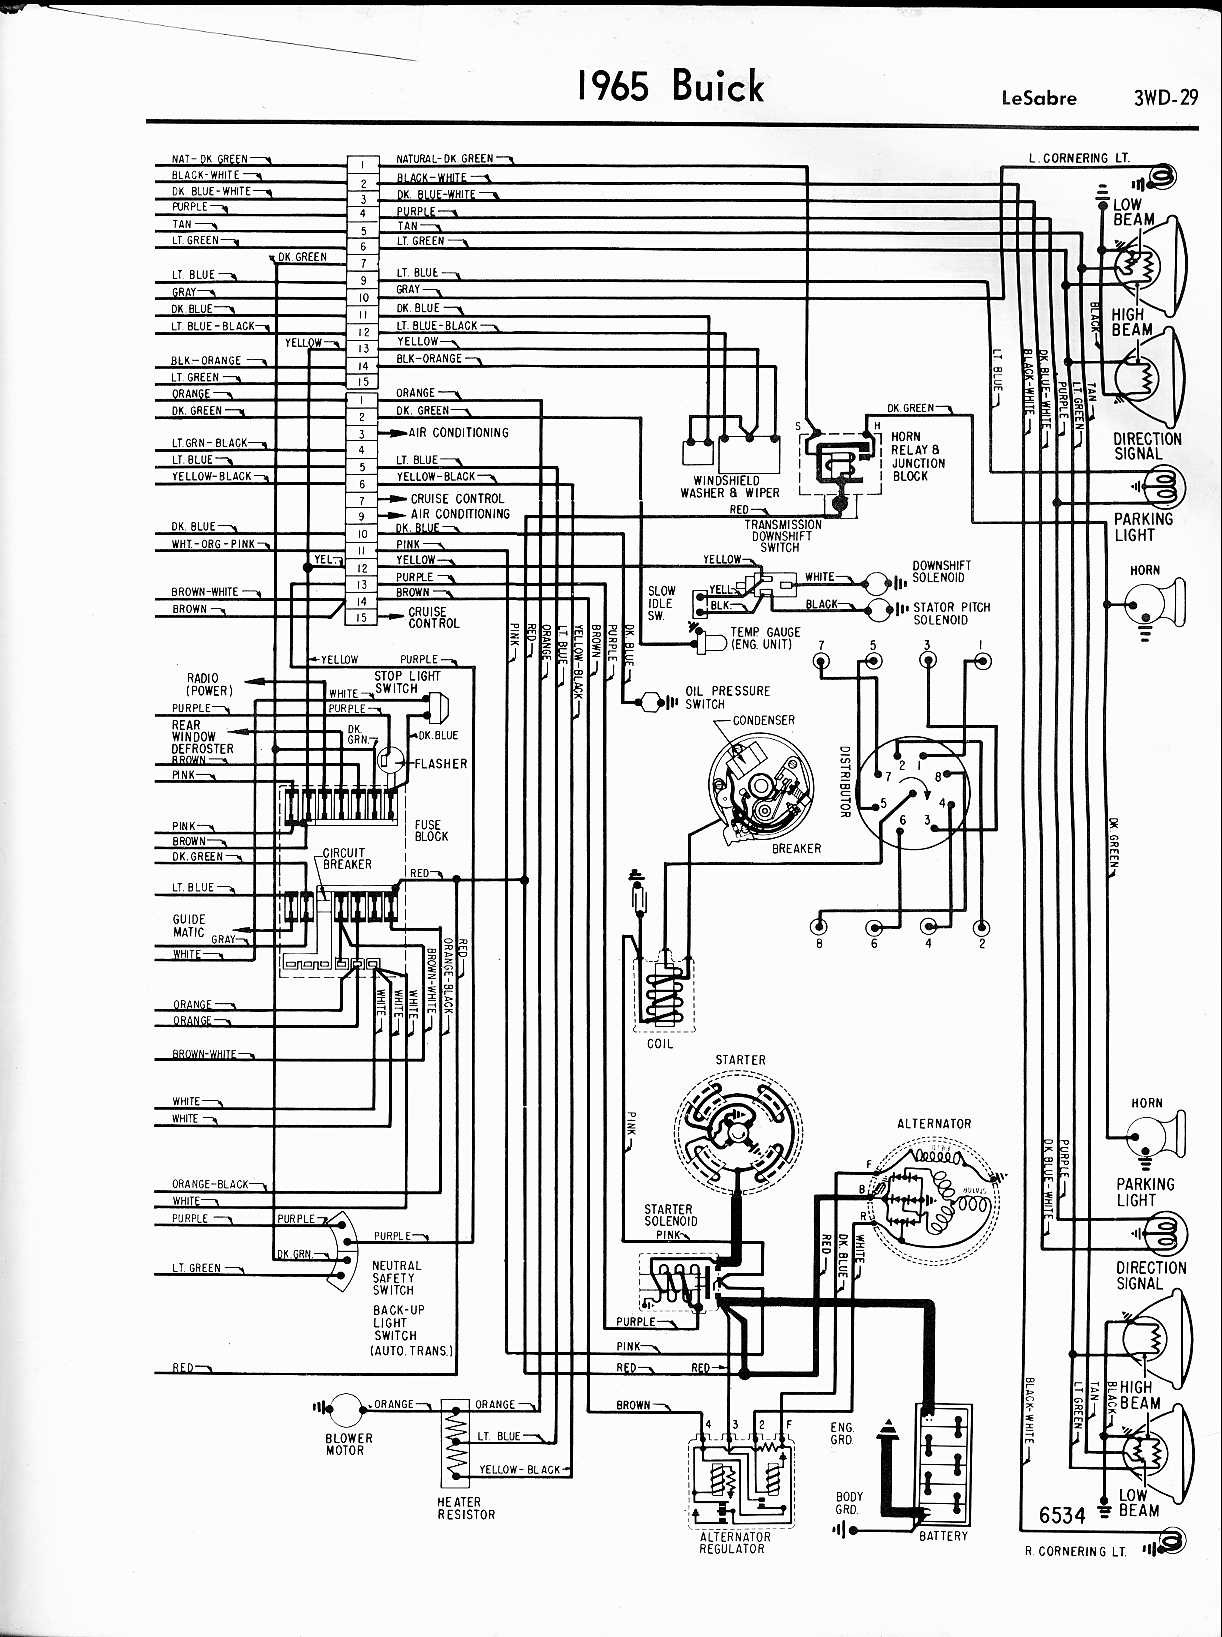 car heater blower motor wiring diagram blower motor wiring